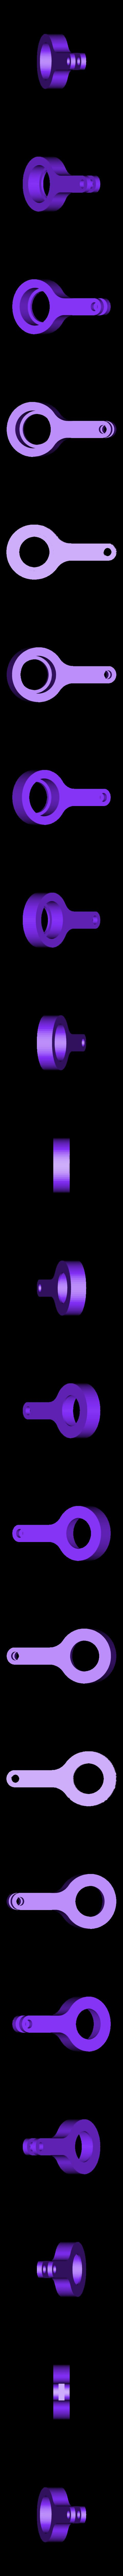 TiltRodamiento.stl Download free STL file Tilt free GoPro • 3D printing model, GuillermoMaroto